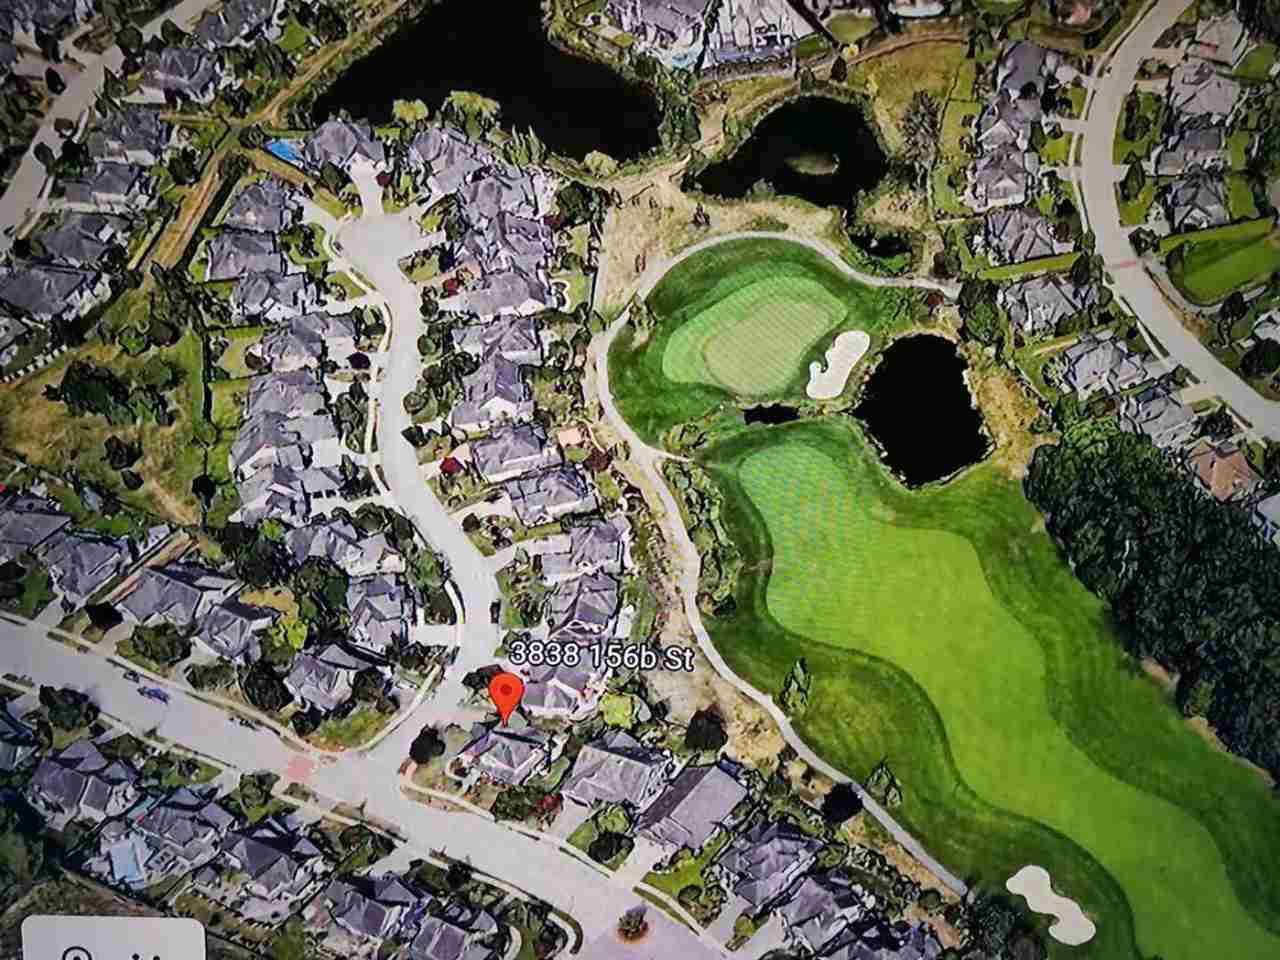 3838 156B STREET - Morgan Creek House/Single Family for sale, 6 Bedrooms (R2530009)